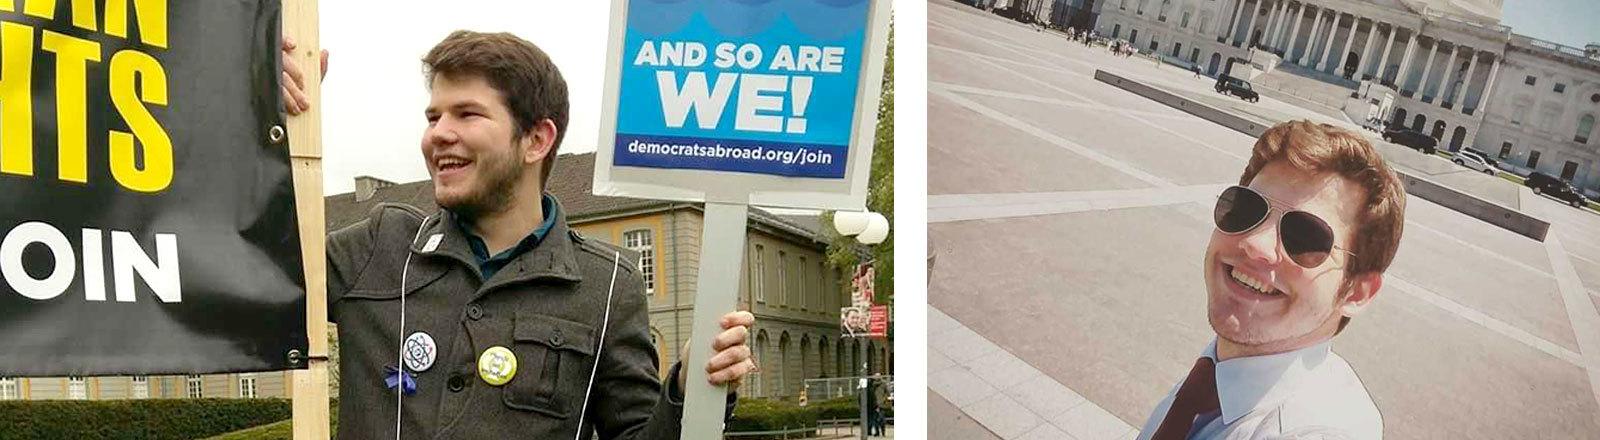 John Grosser beim Wahlkampf